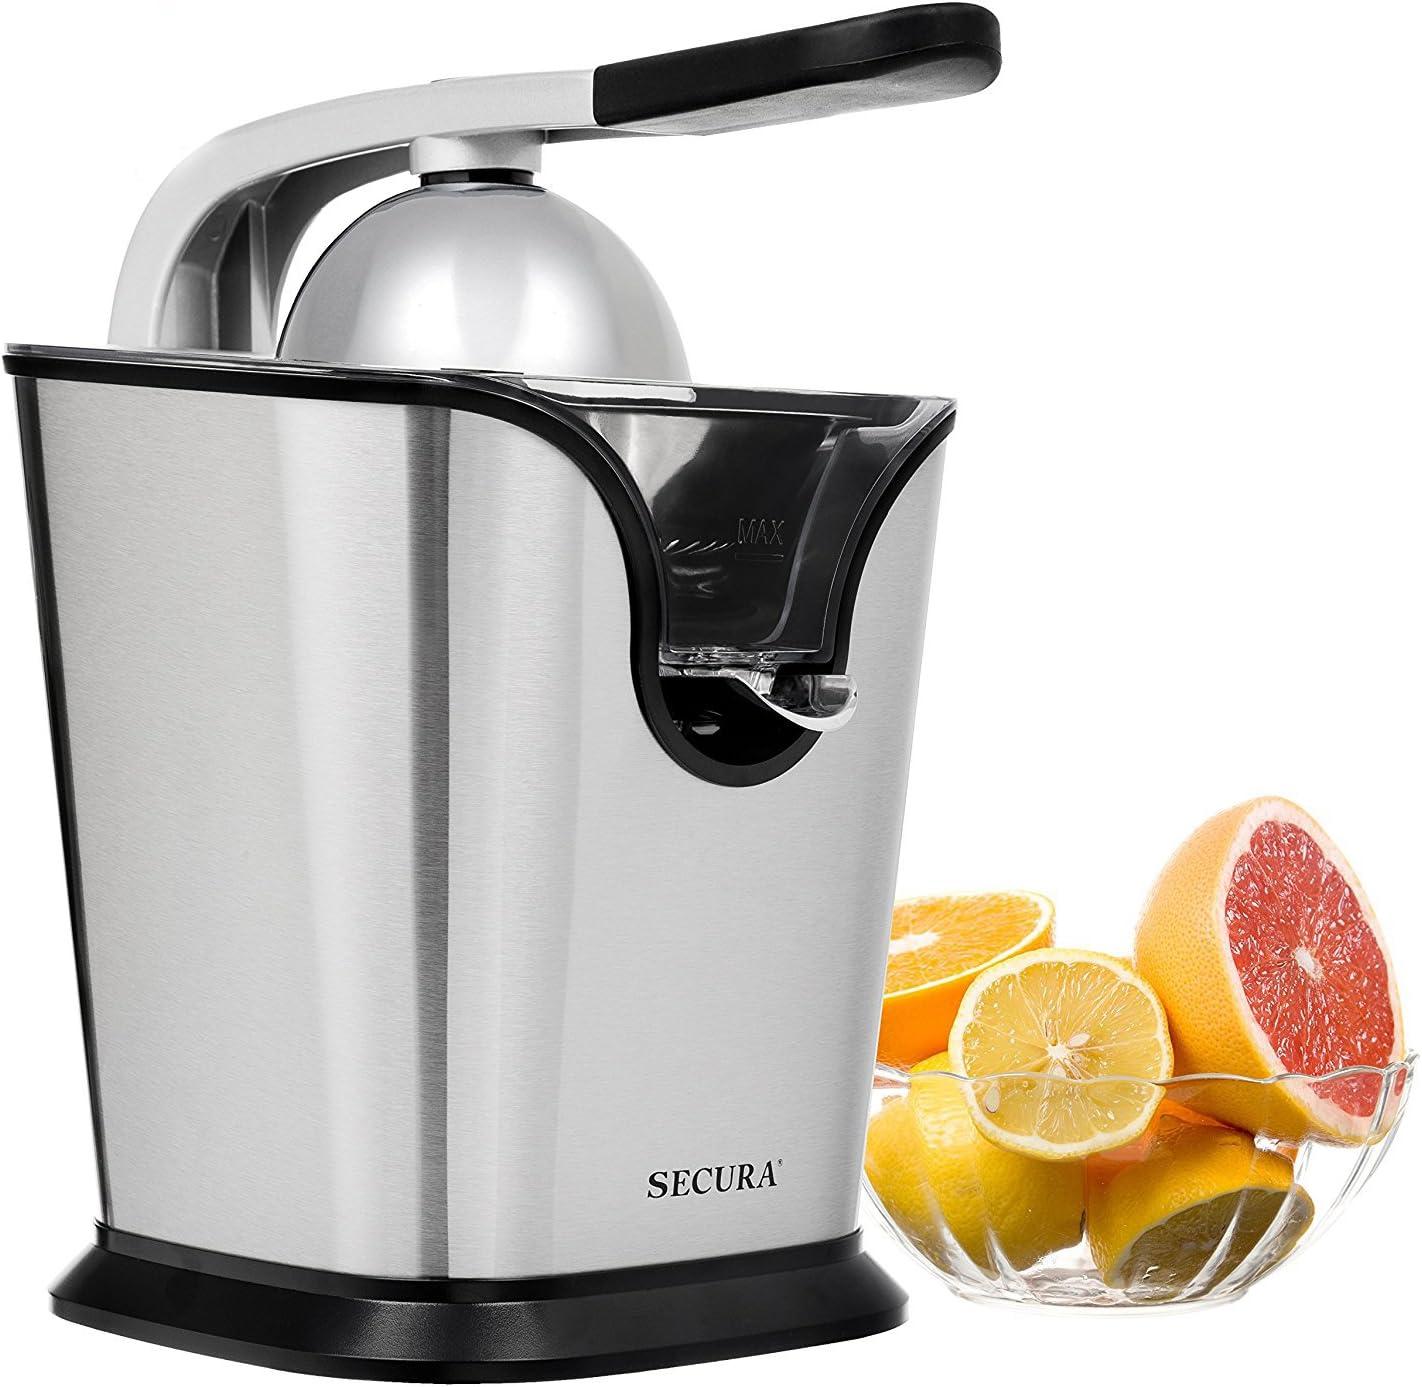 Electric Citrus Juicer Press | 160 Watt Stainless Steel Orange Juice Squeezer by Secura